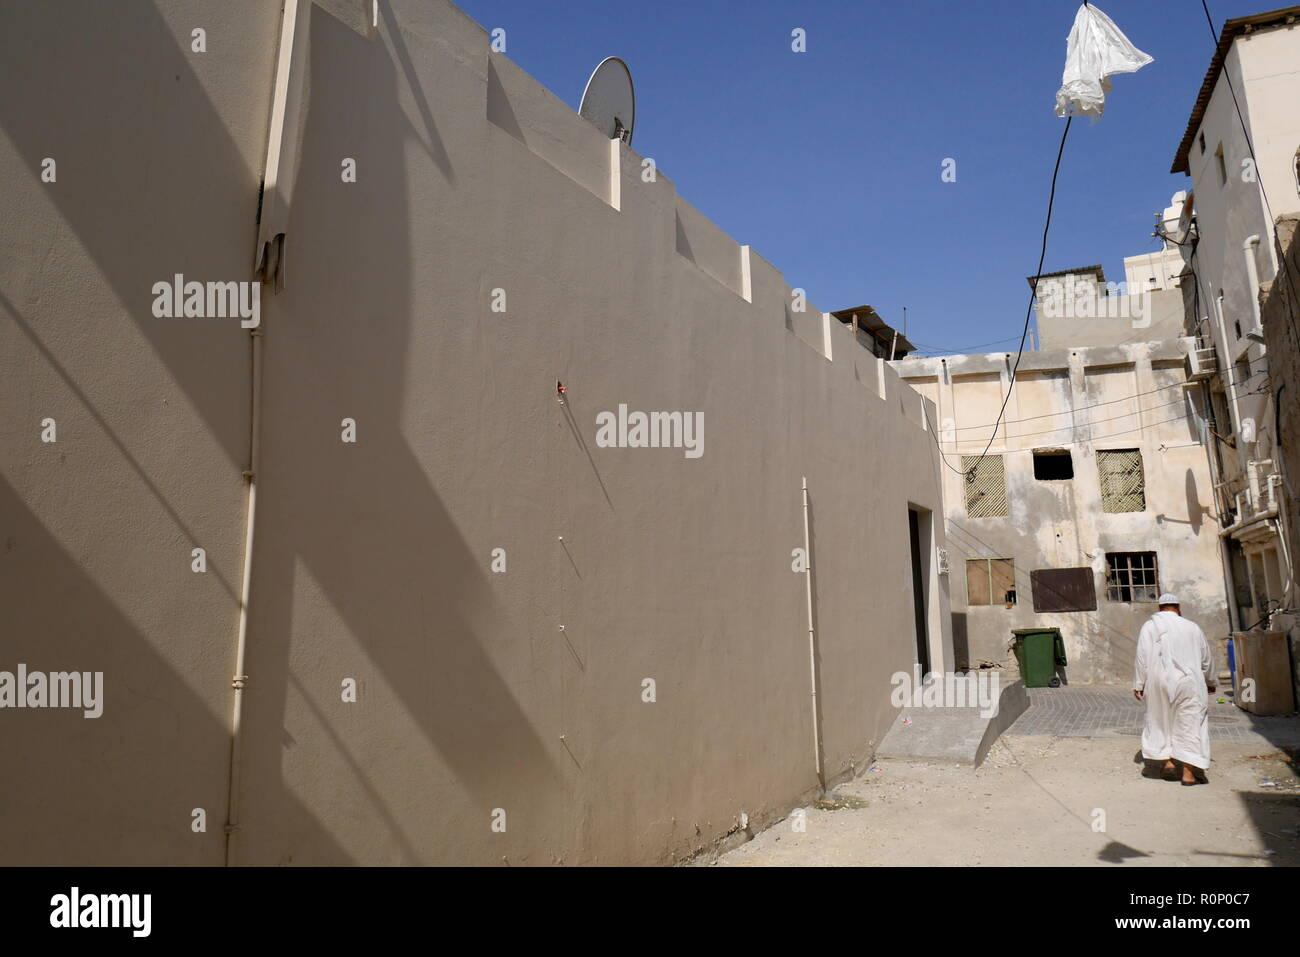 Bahraini Stock Photos & Bahraini Stock Images - Alamy